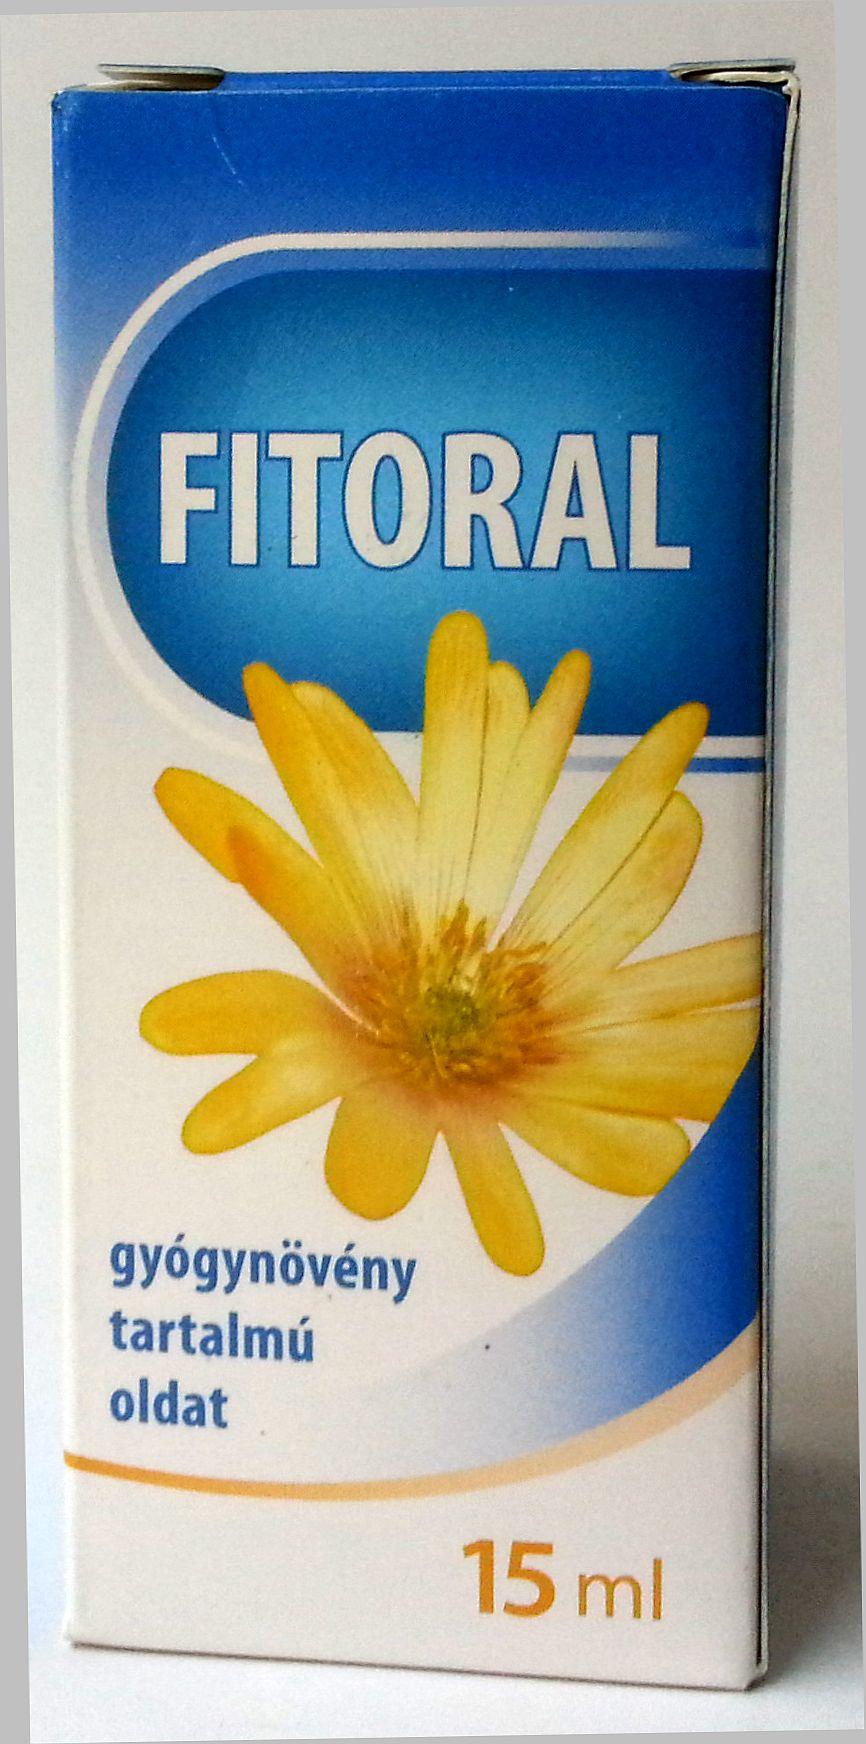 FITORAL.jpg